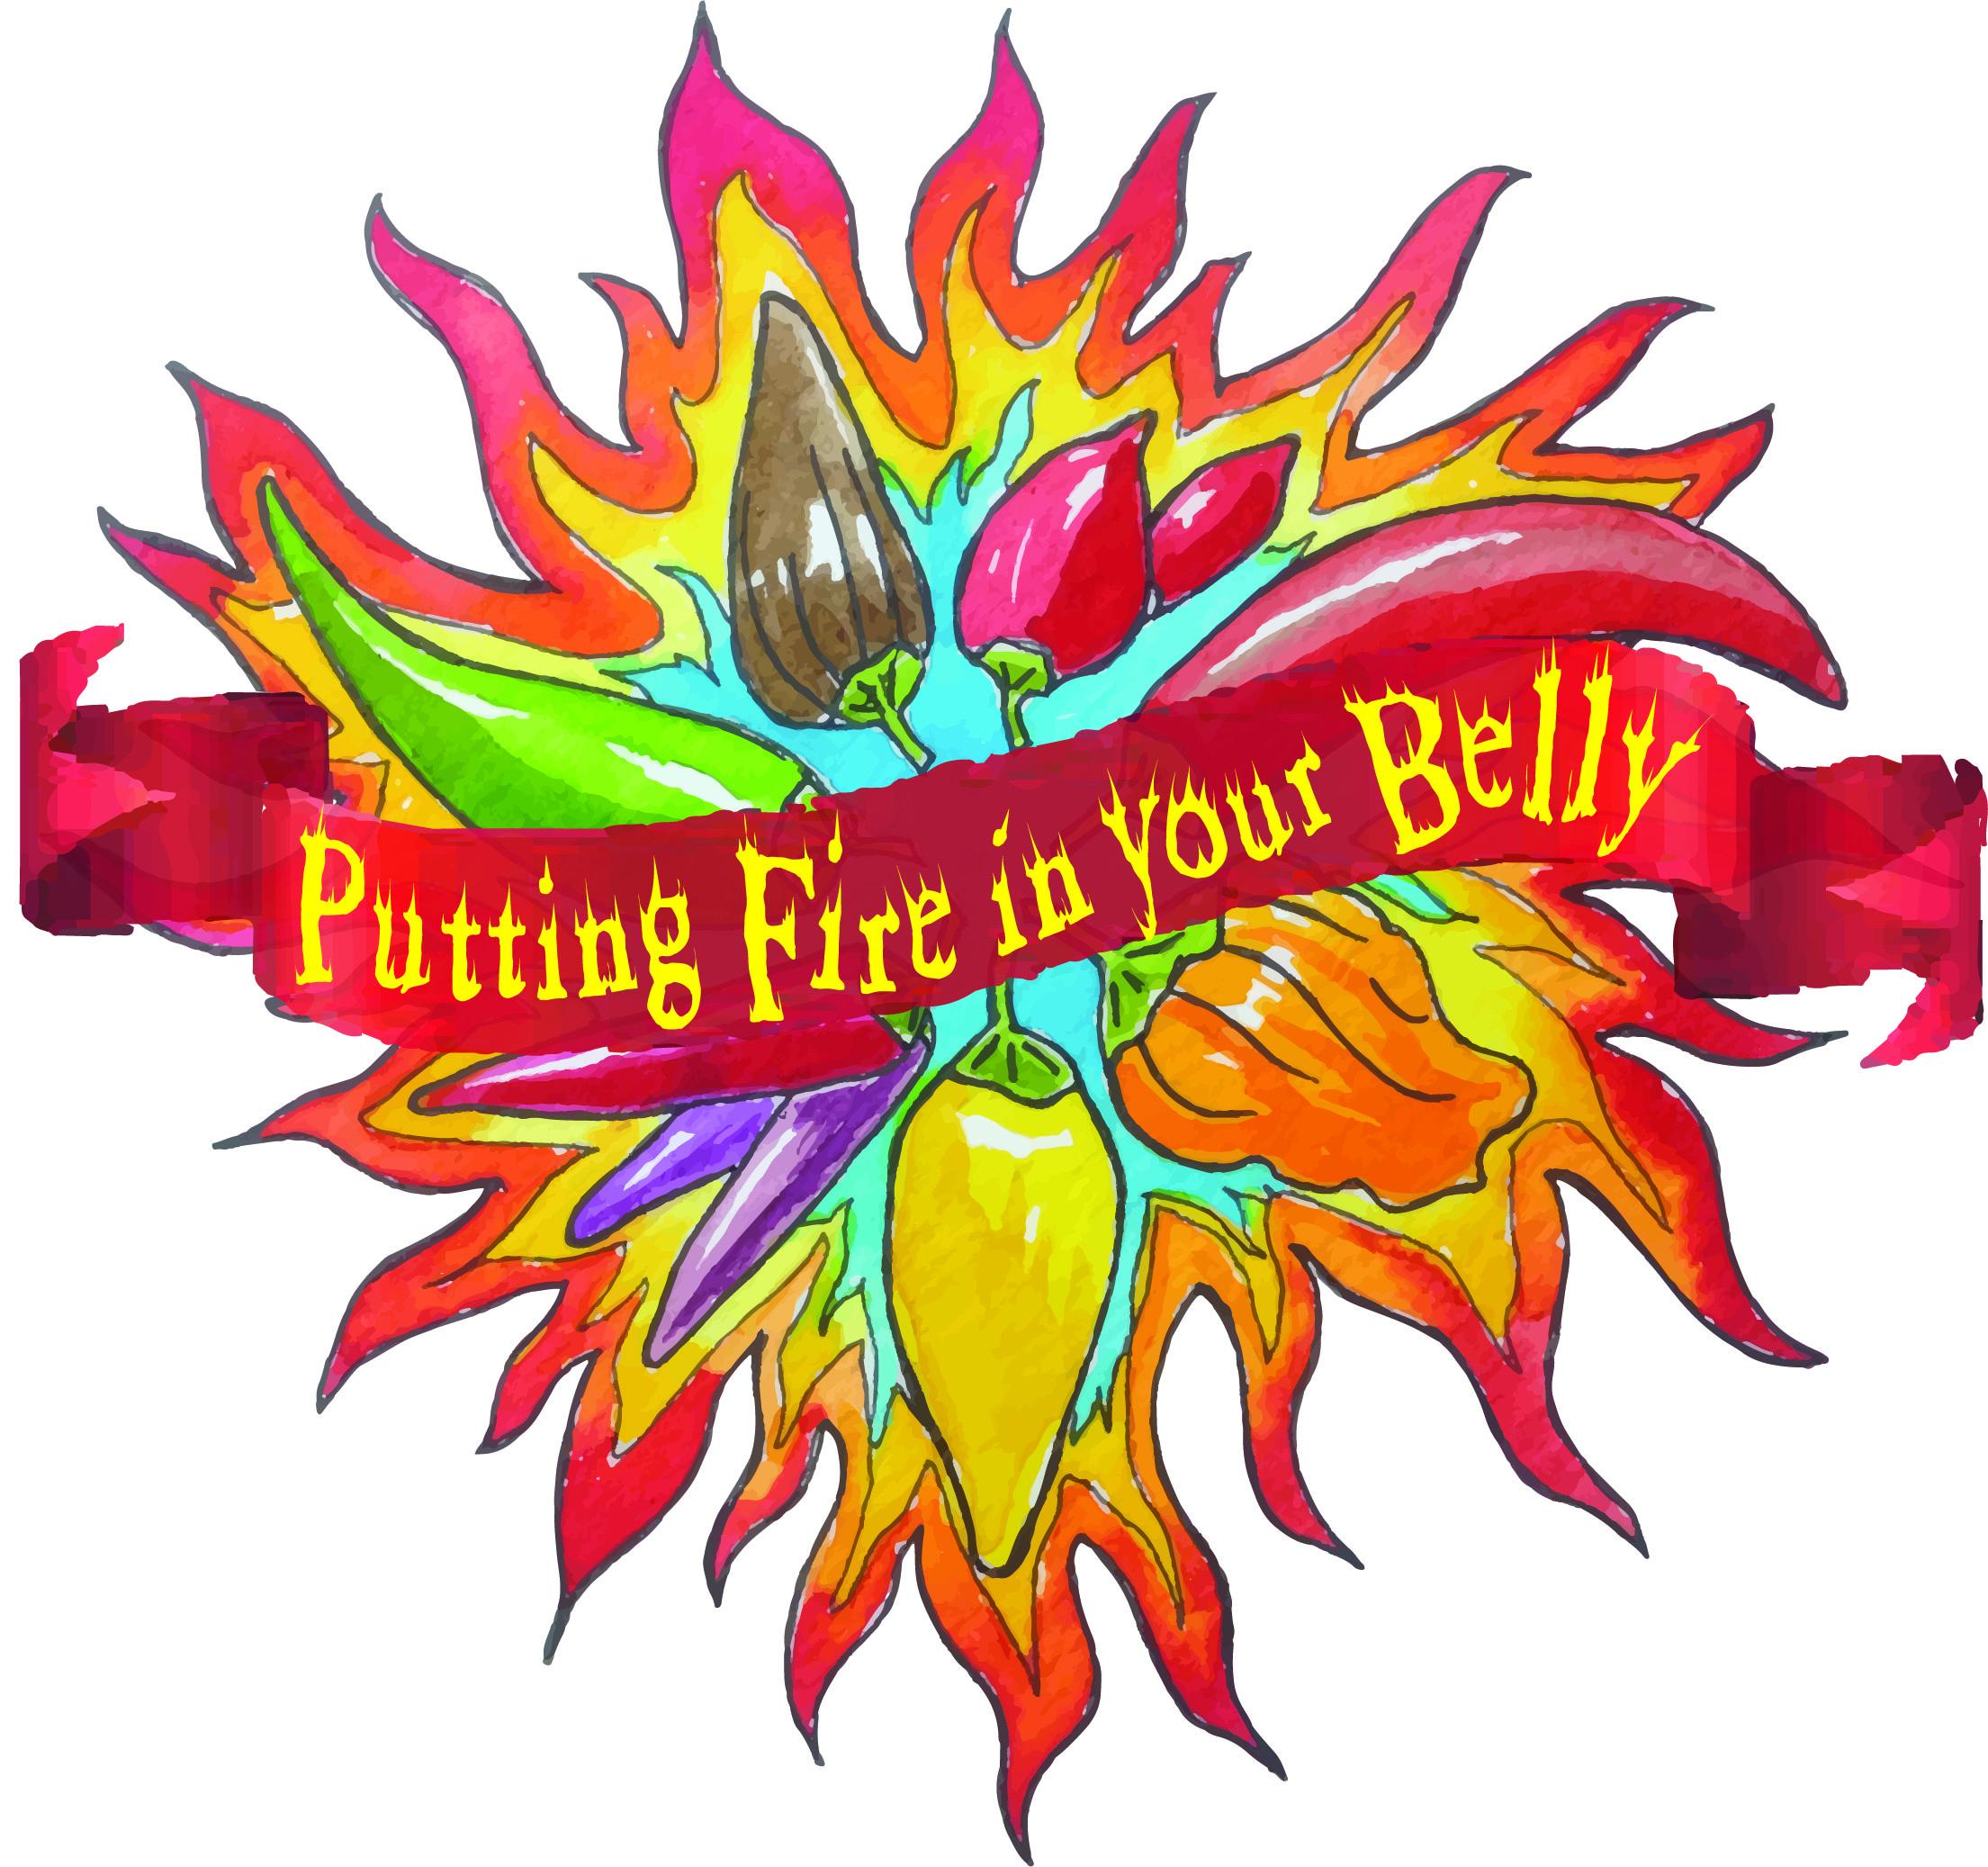 COMMUNITY: ChilliFest now part of double bill event! 21st September